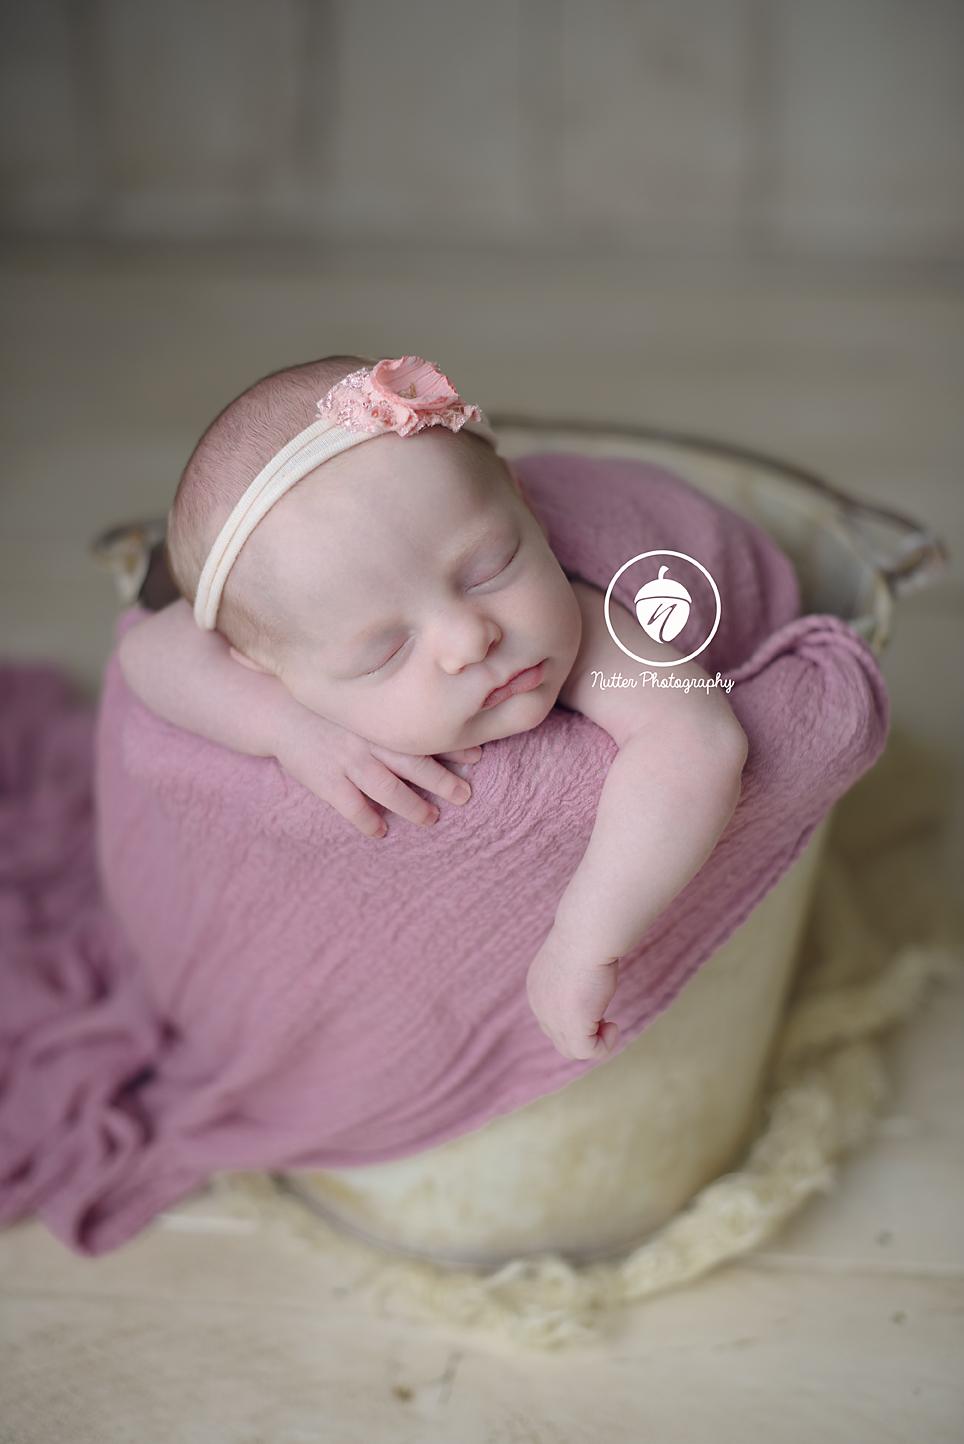 Baby girl in Bucket pose